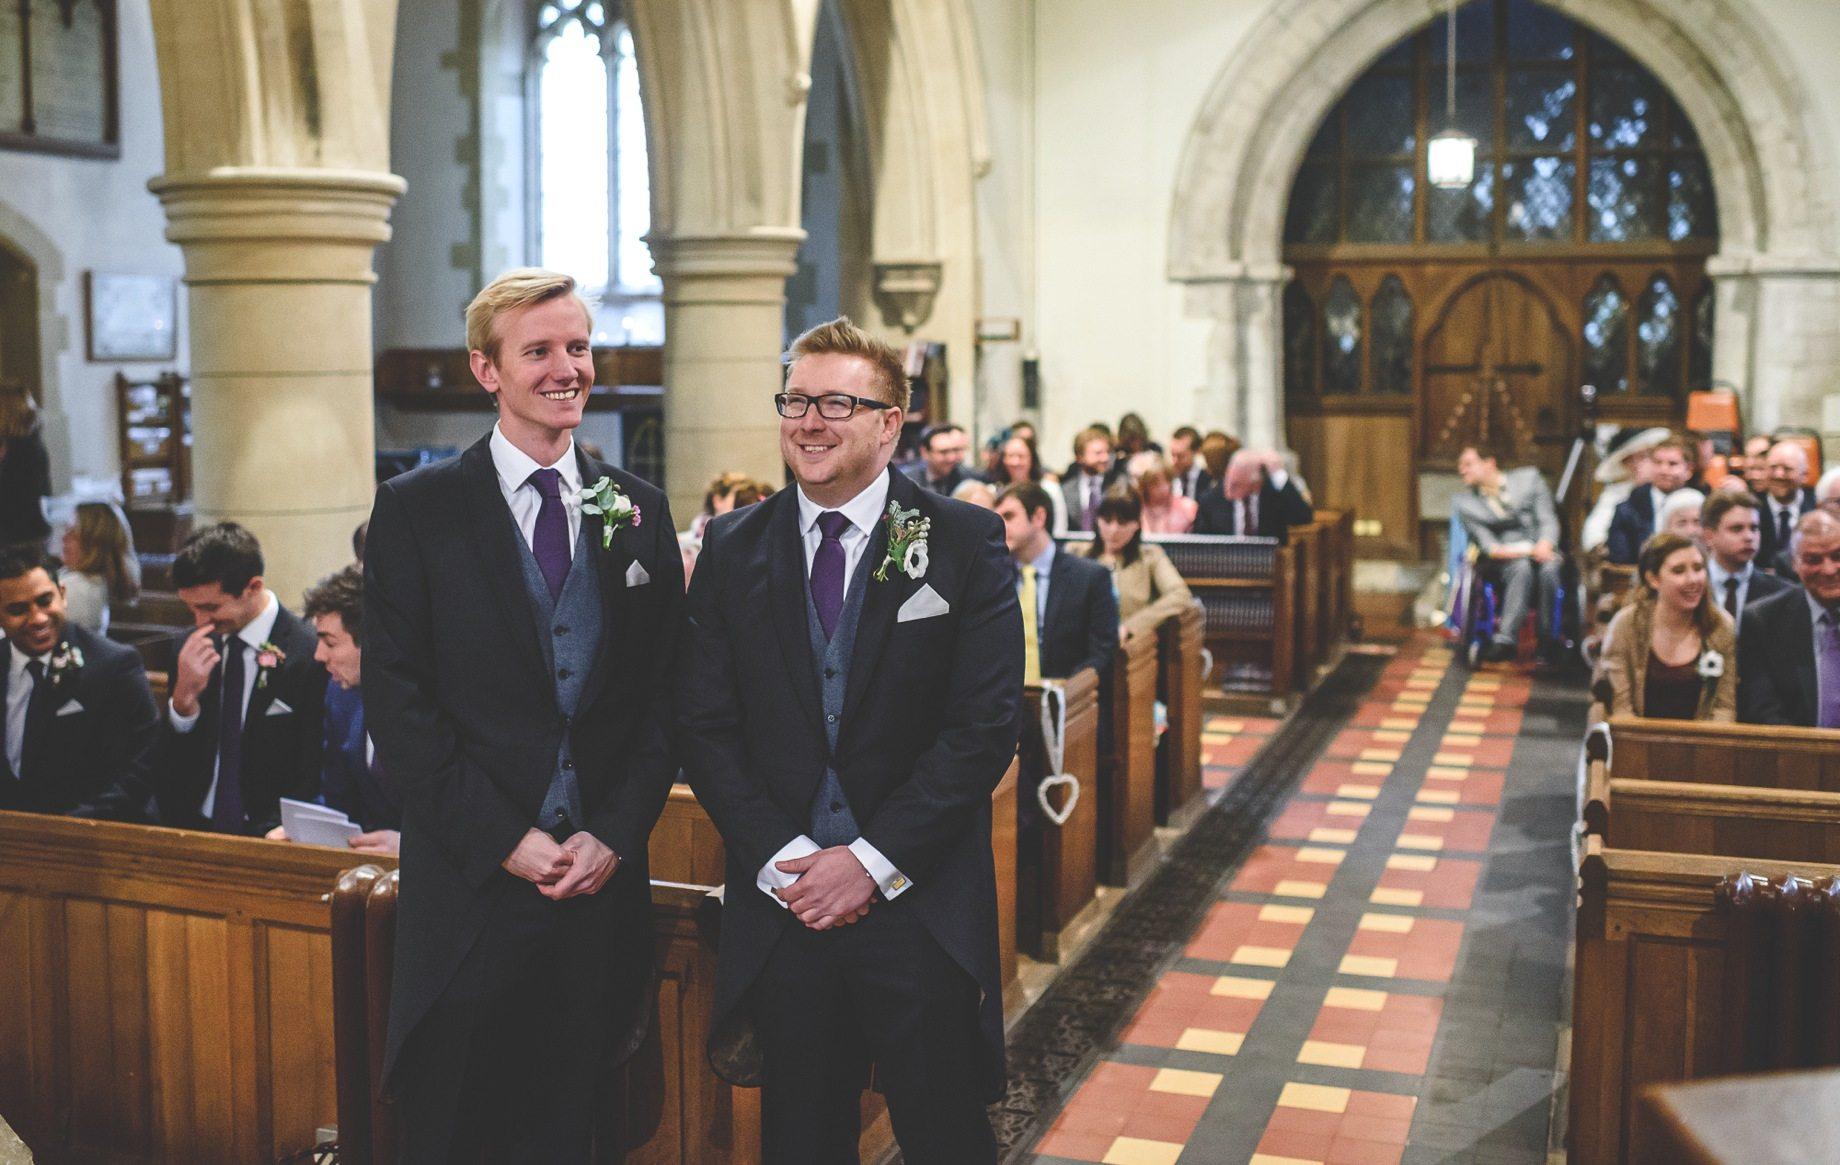 Heather and Chris - Hampshire wedding photography (63 of 174)